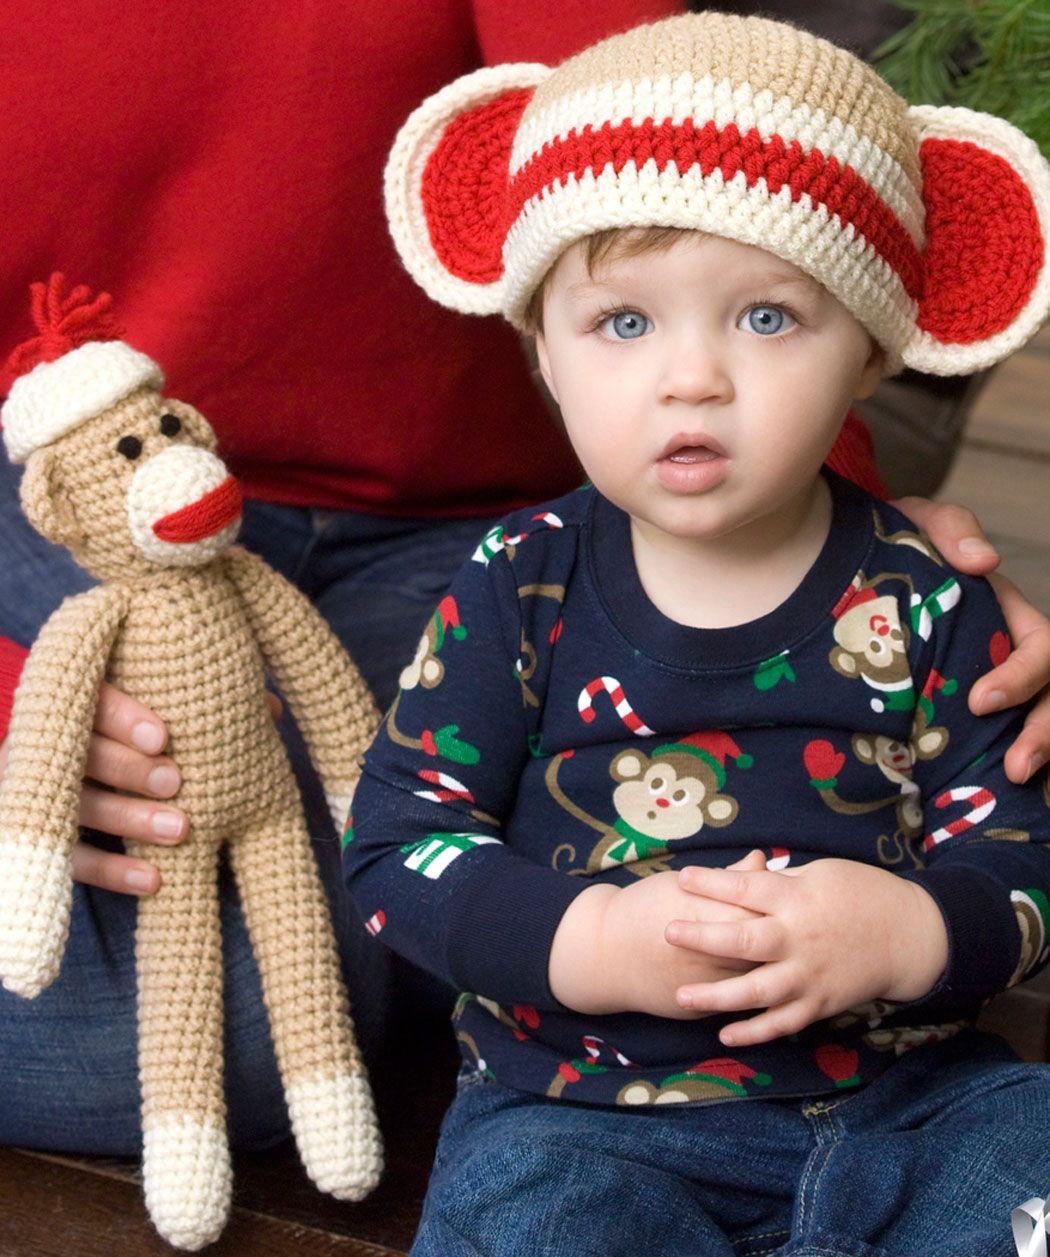 Sock Monkey and Baby Hat free crochet pattern by Red Heart yarns.  #crochet